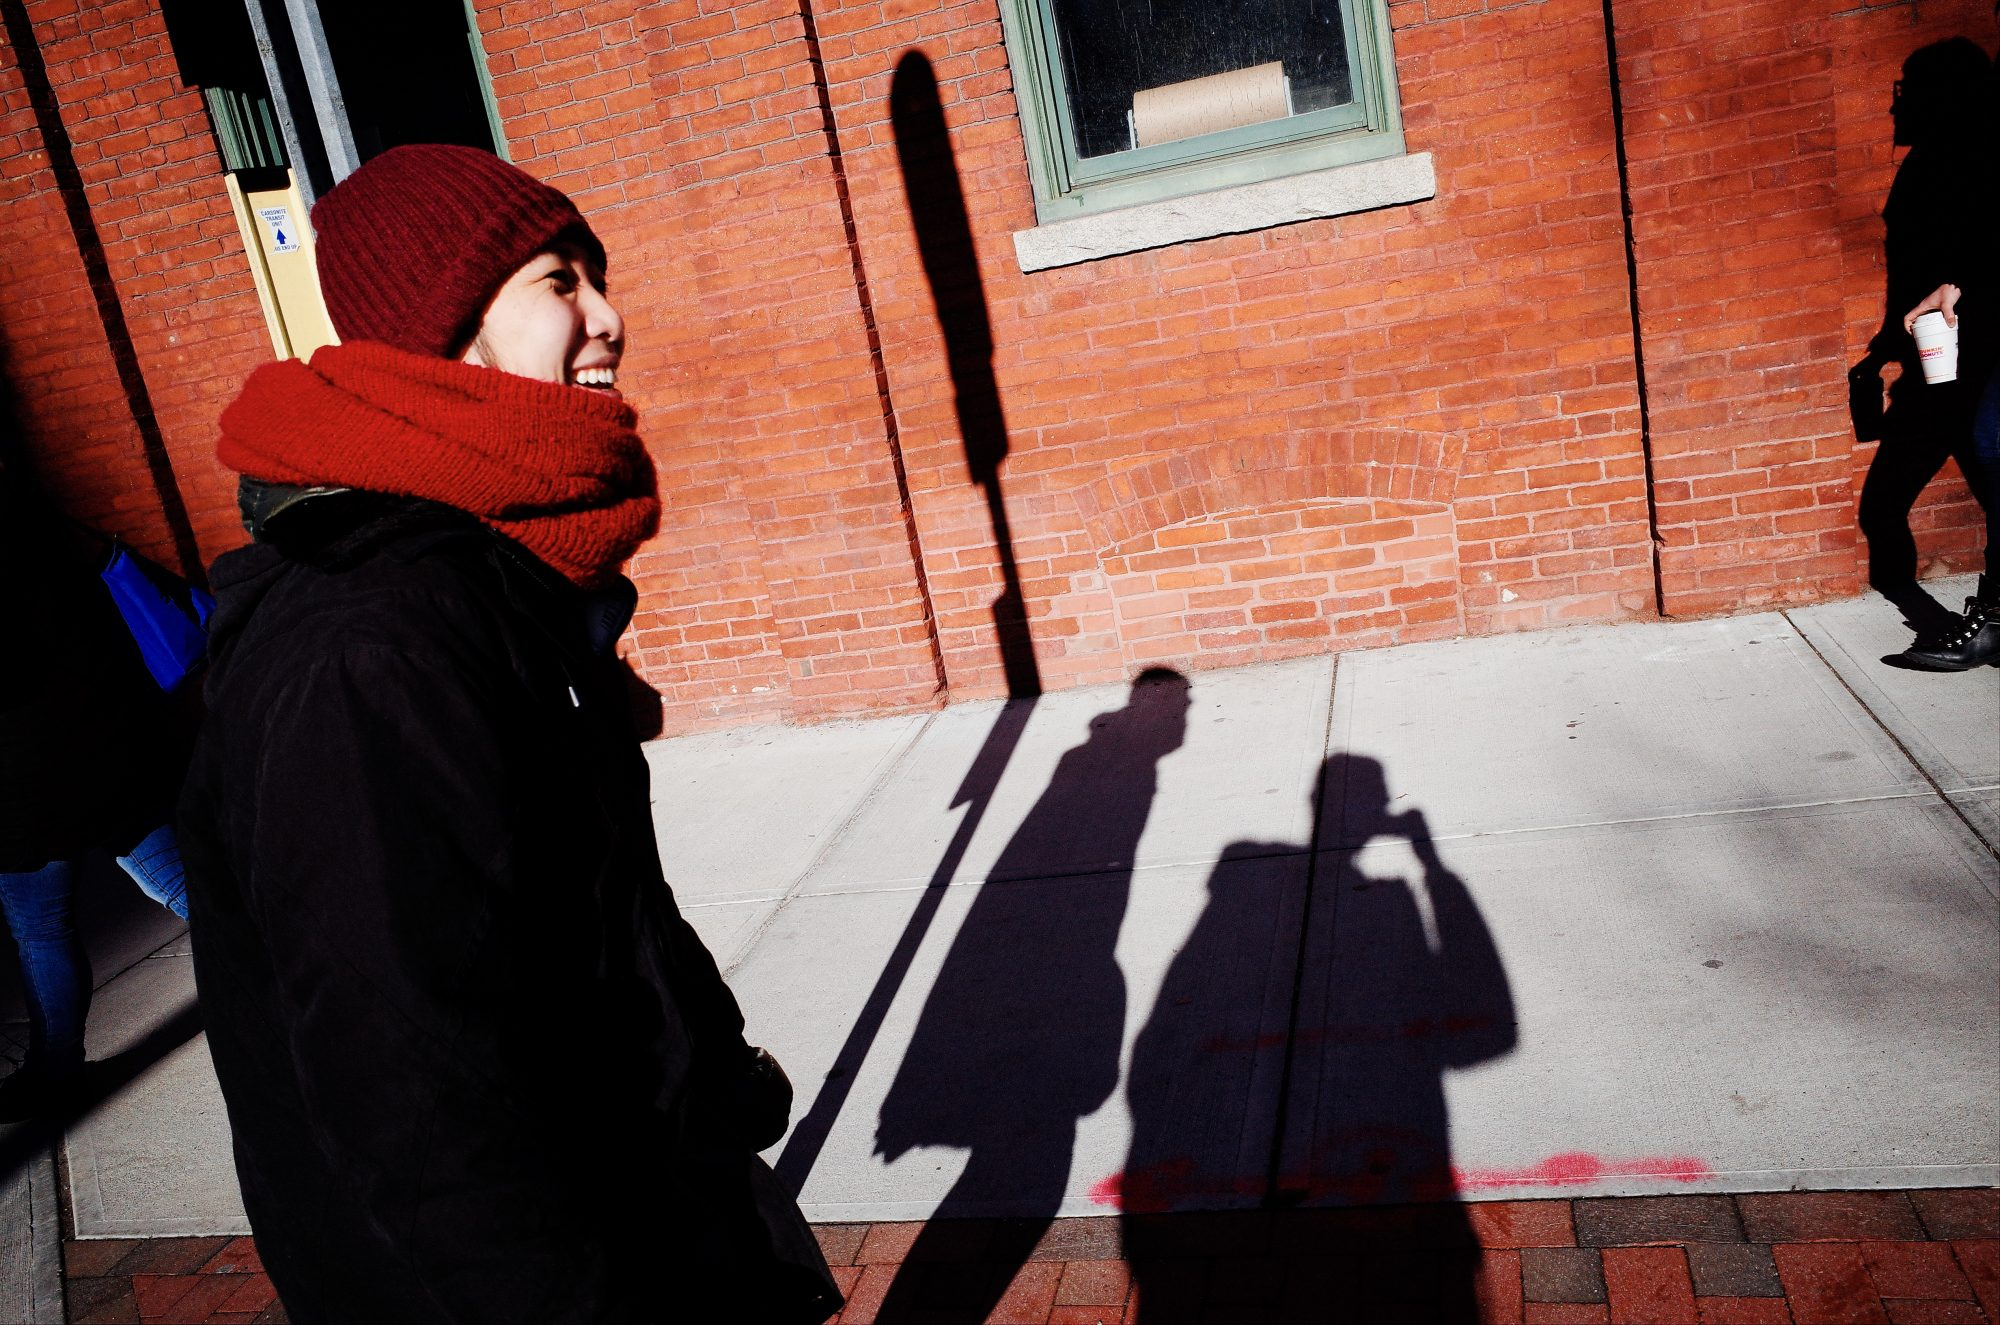 Cindy, selfie shadow. Boston, 2018